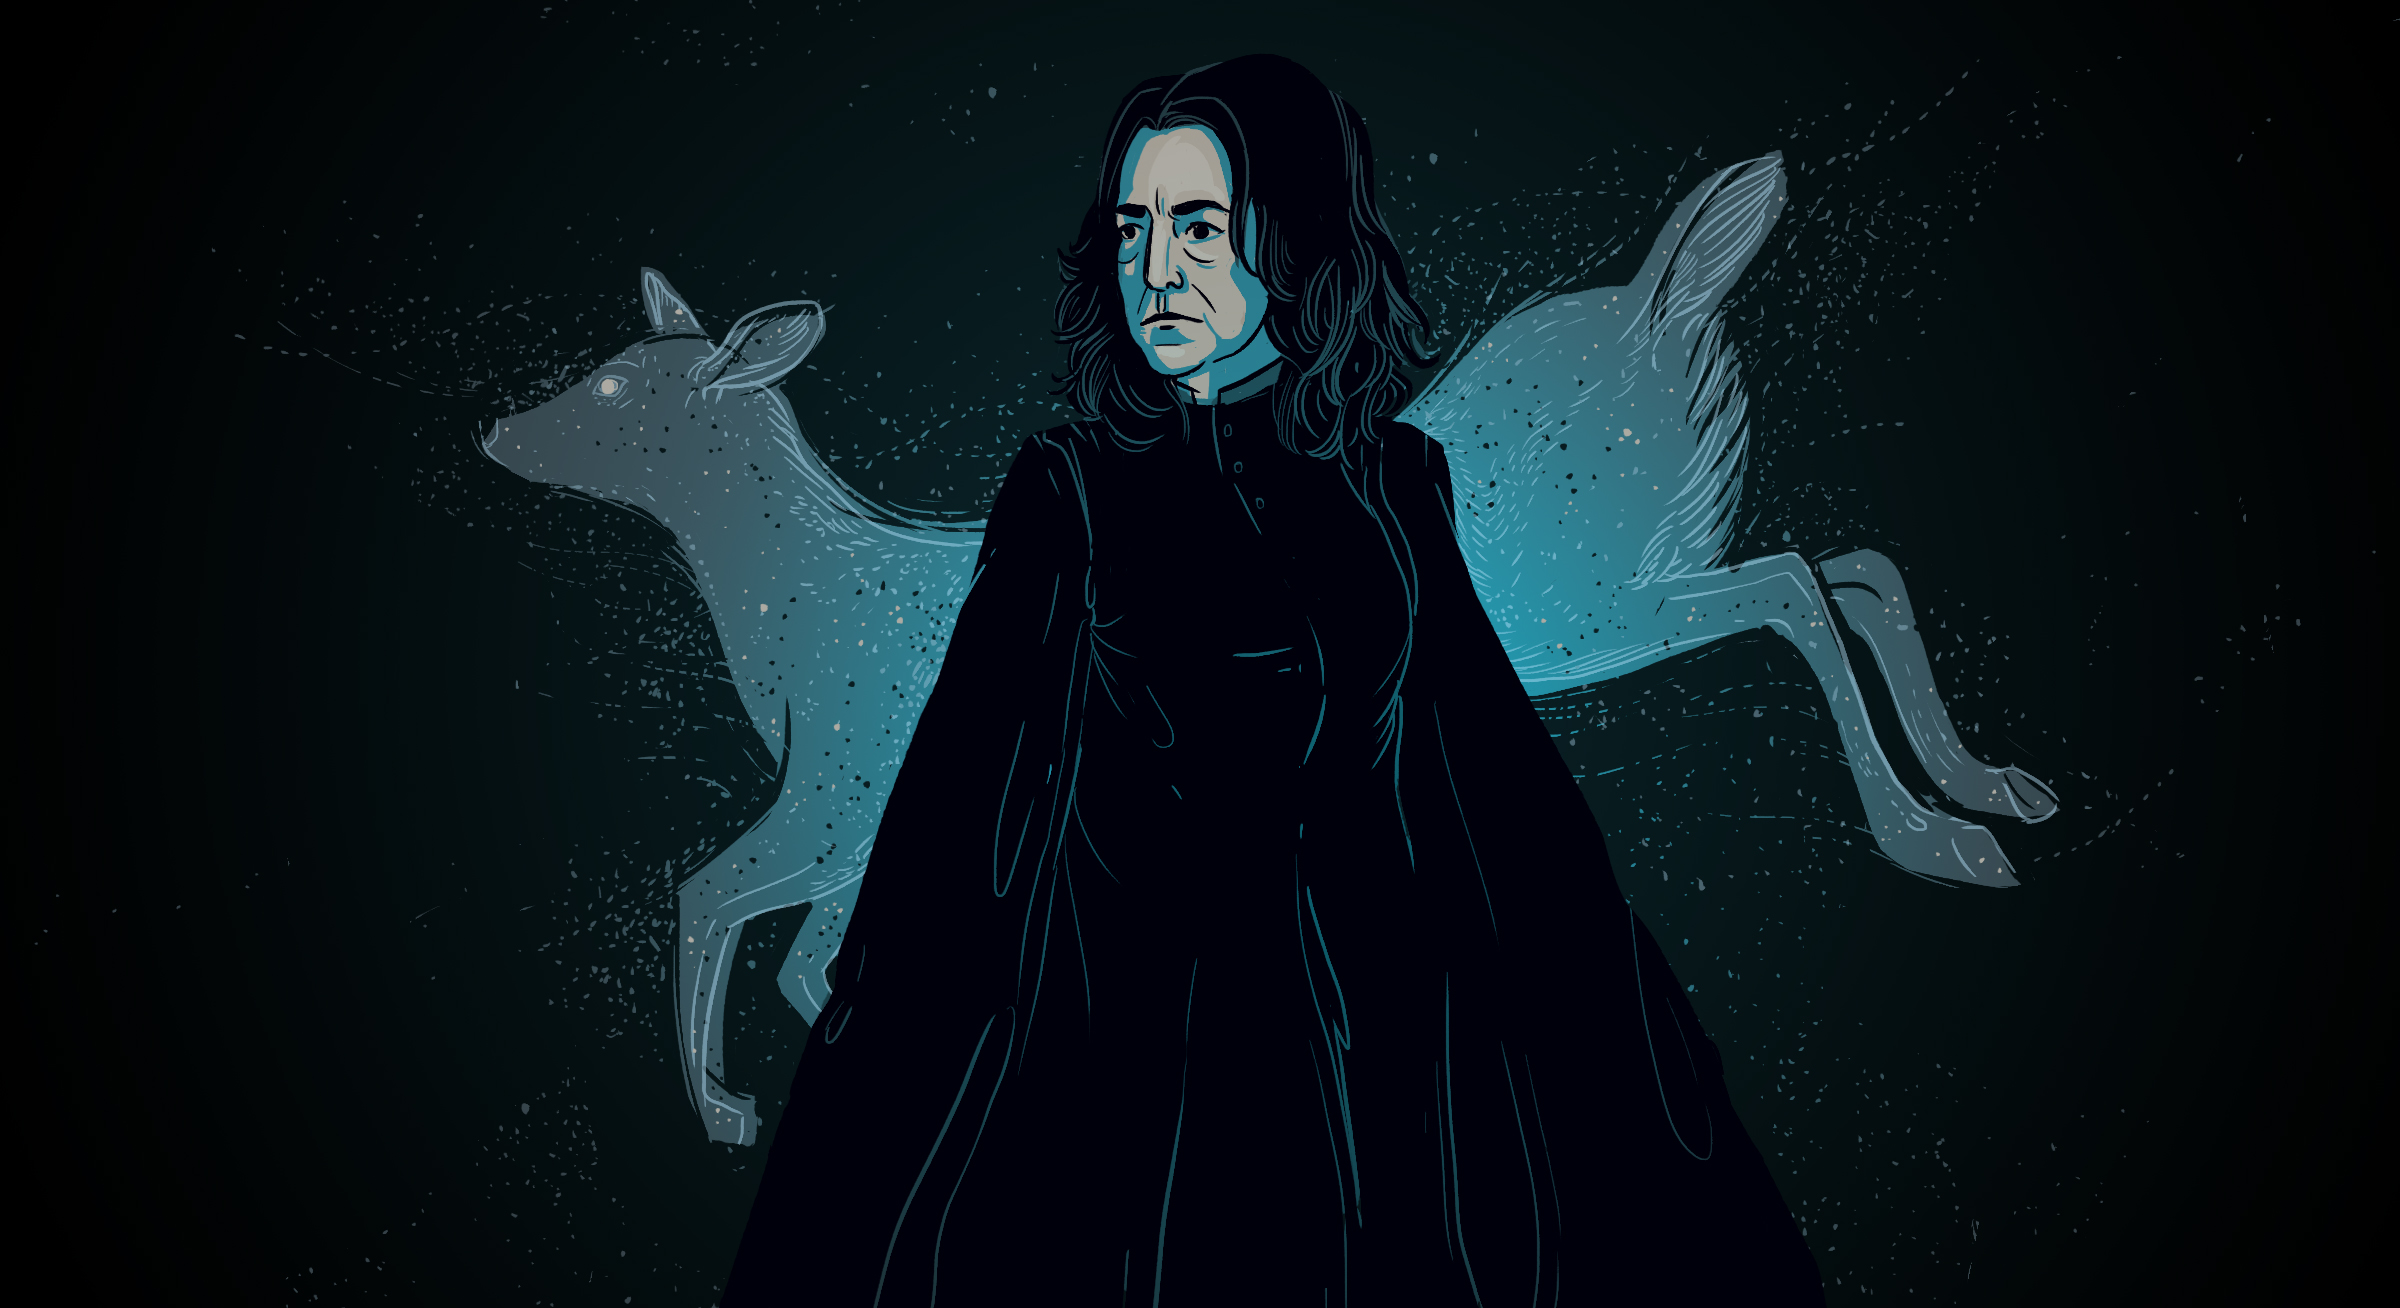 The Shockingly Convincing Argument That Severus Snape Is Transgender